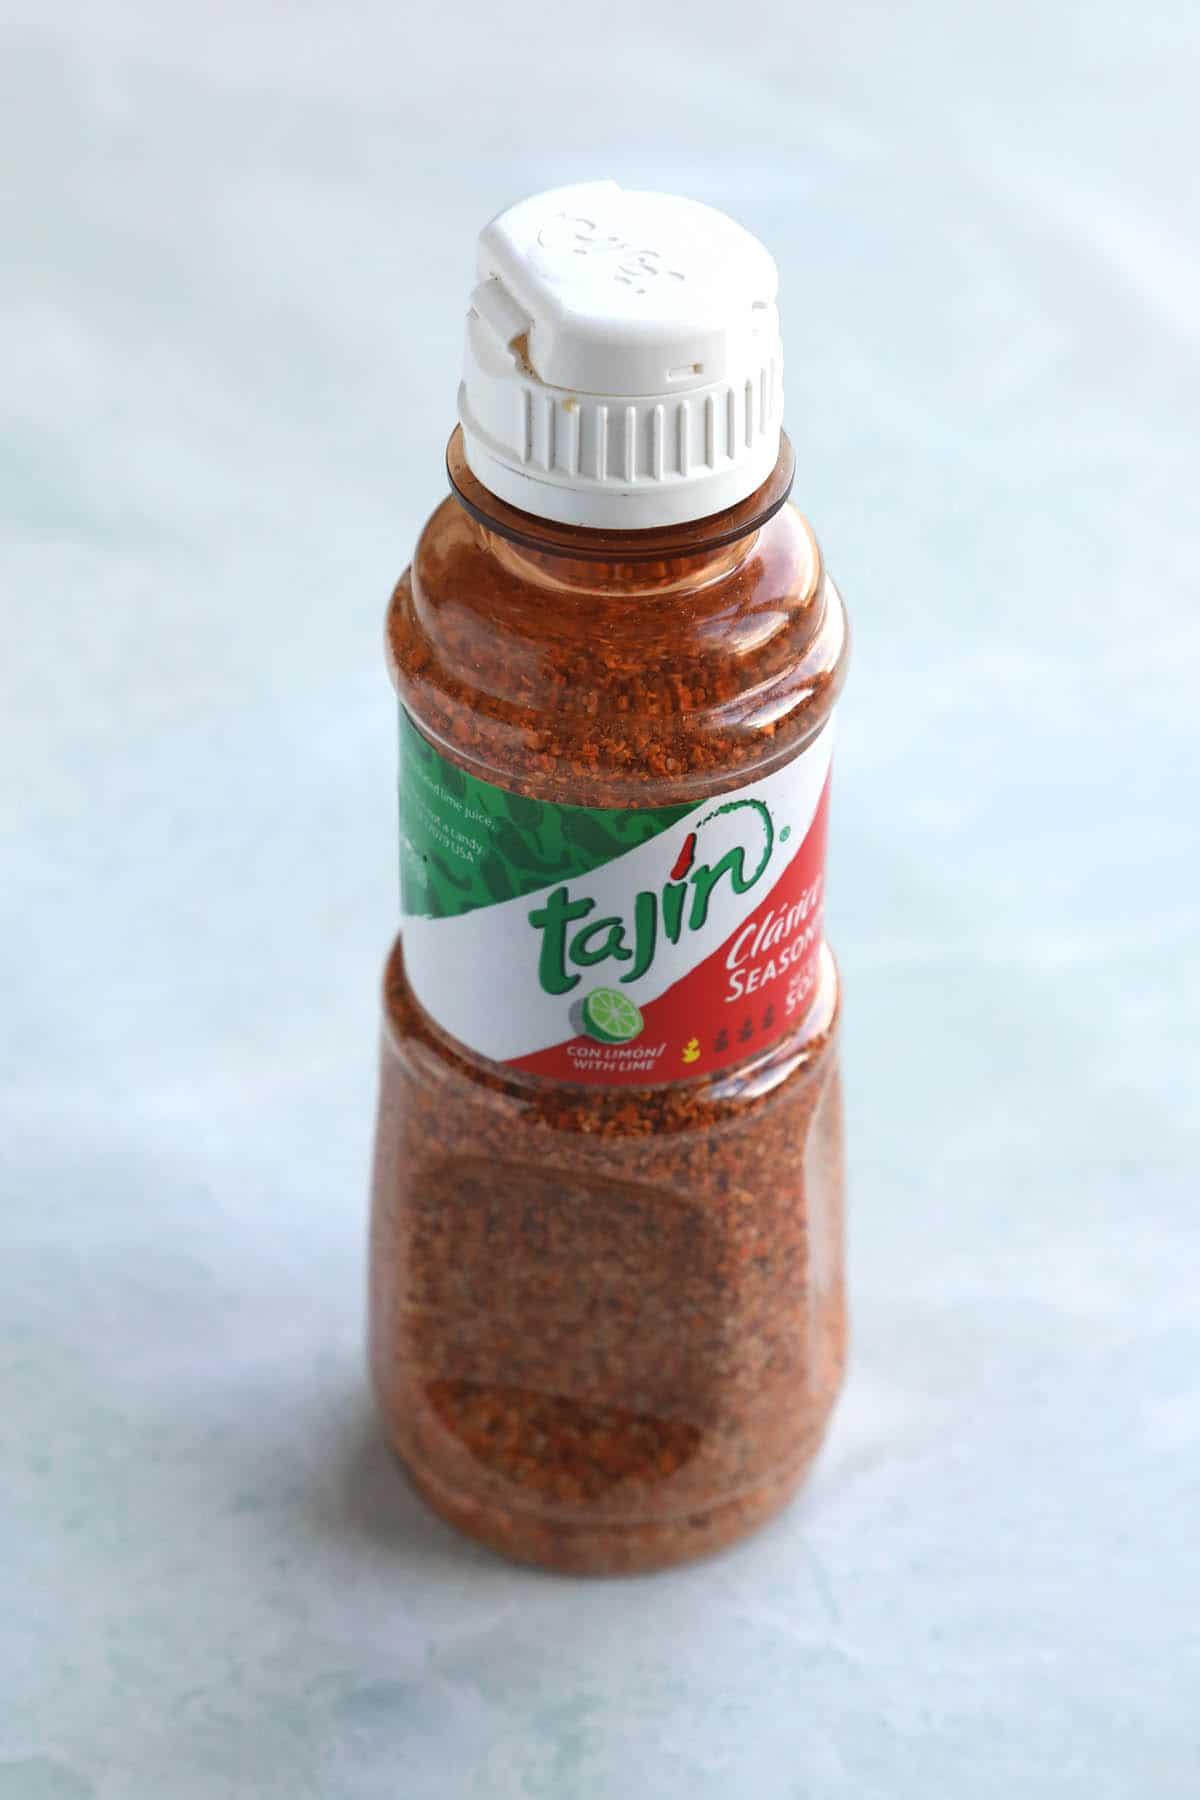 Tajin: Popular Mexican Chili-Lime Seasoning